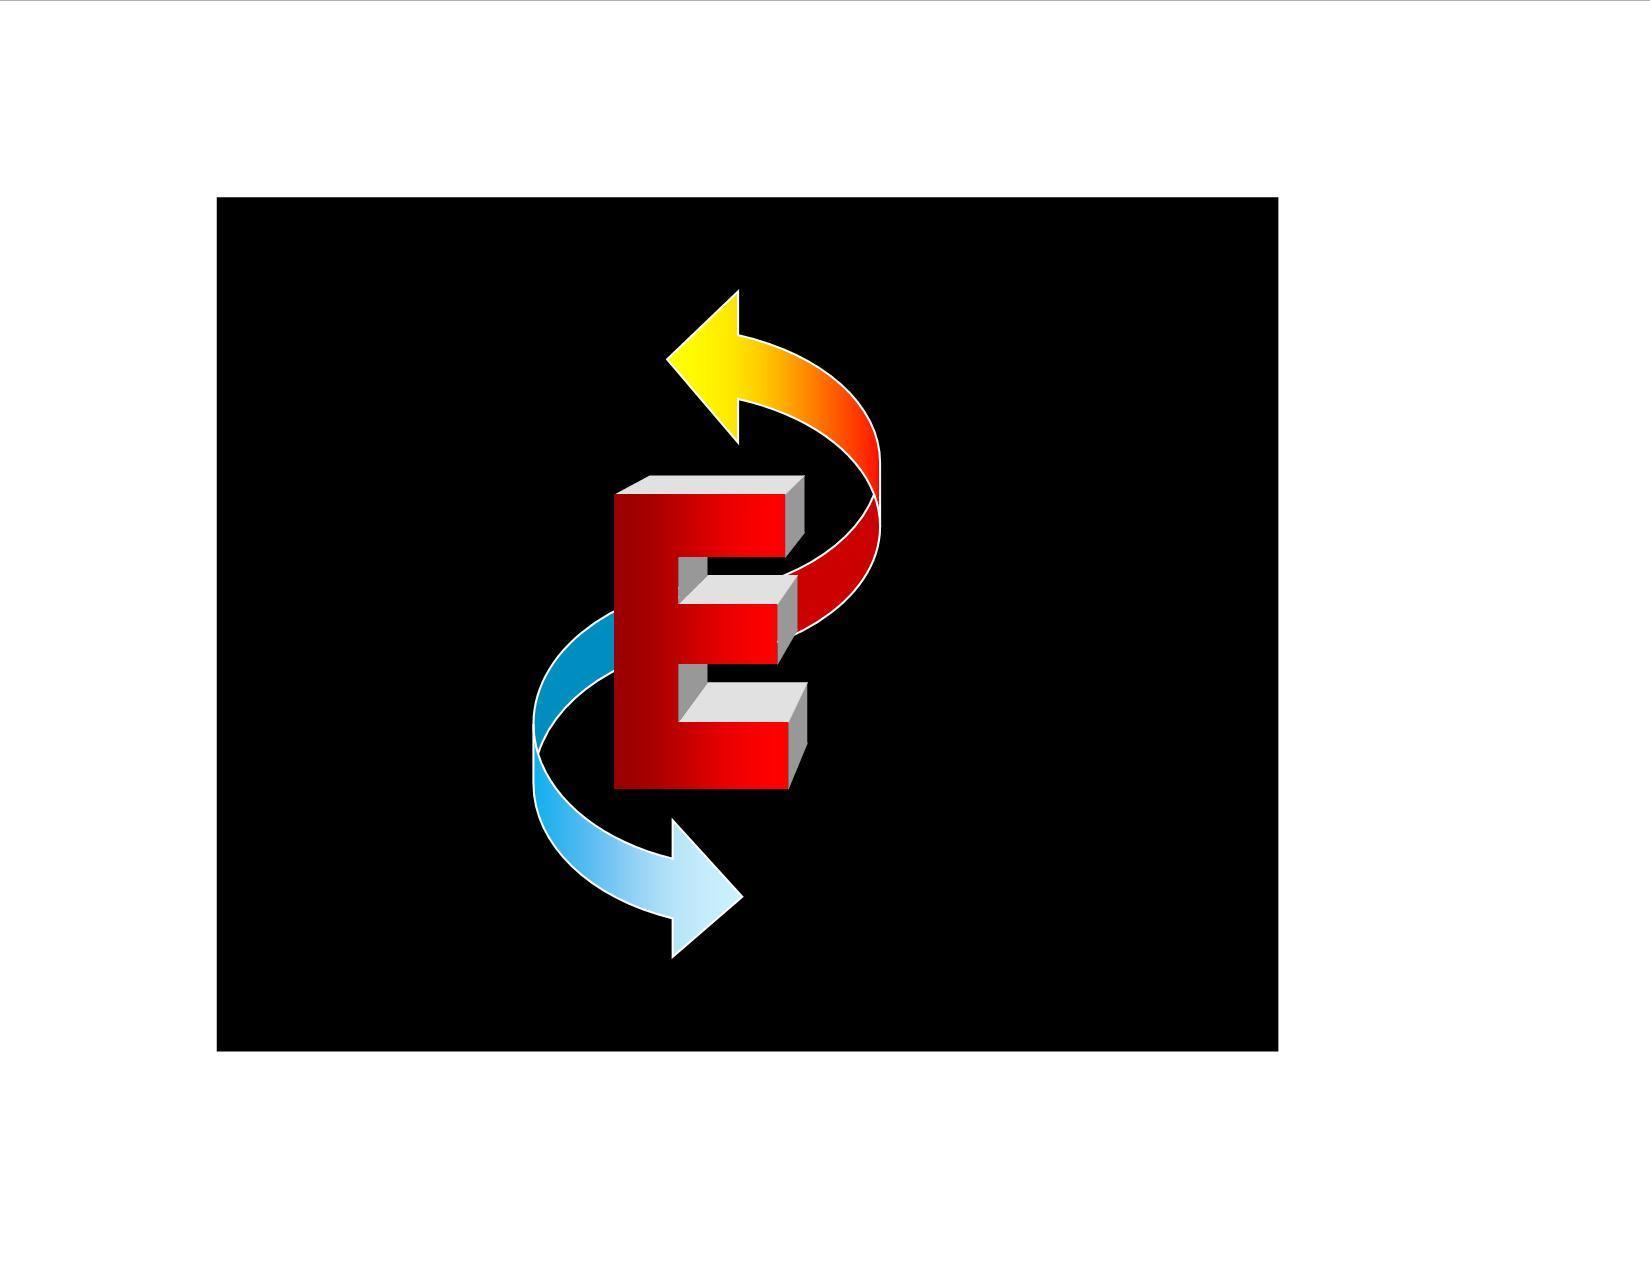 Red-E Air image 1